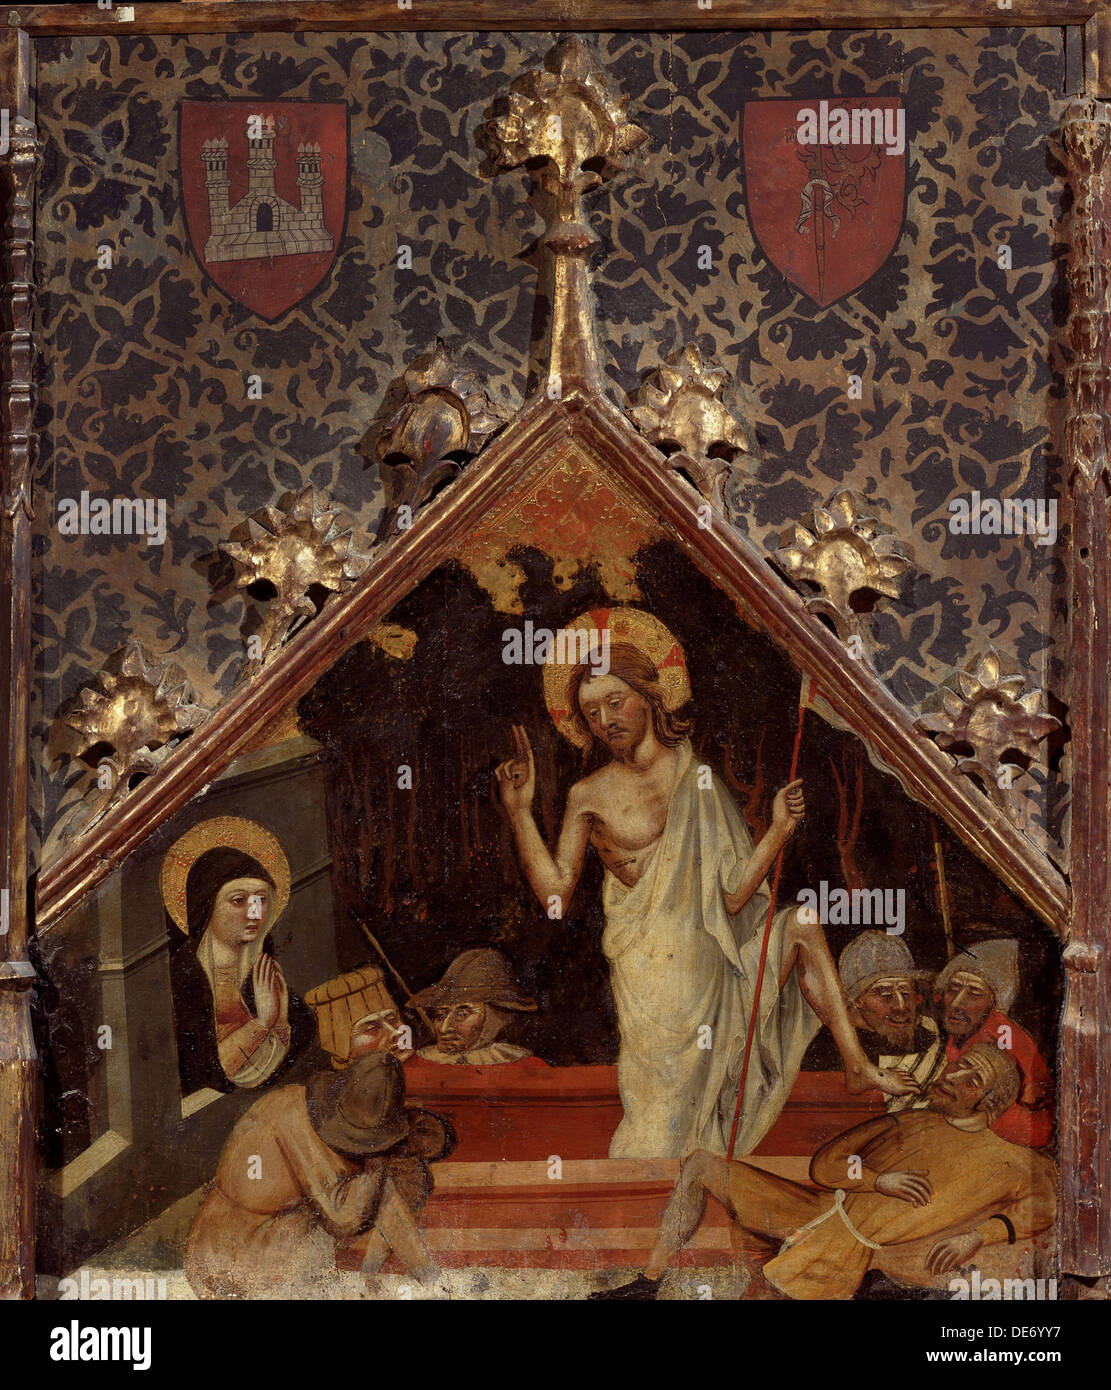 The Resurrection of Christ, 15th century. Artist: German master - Stock Image